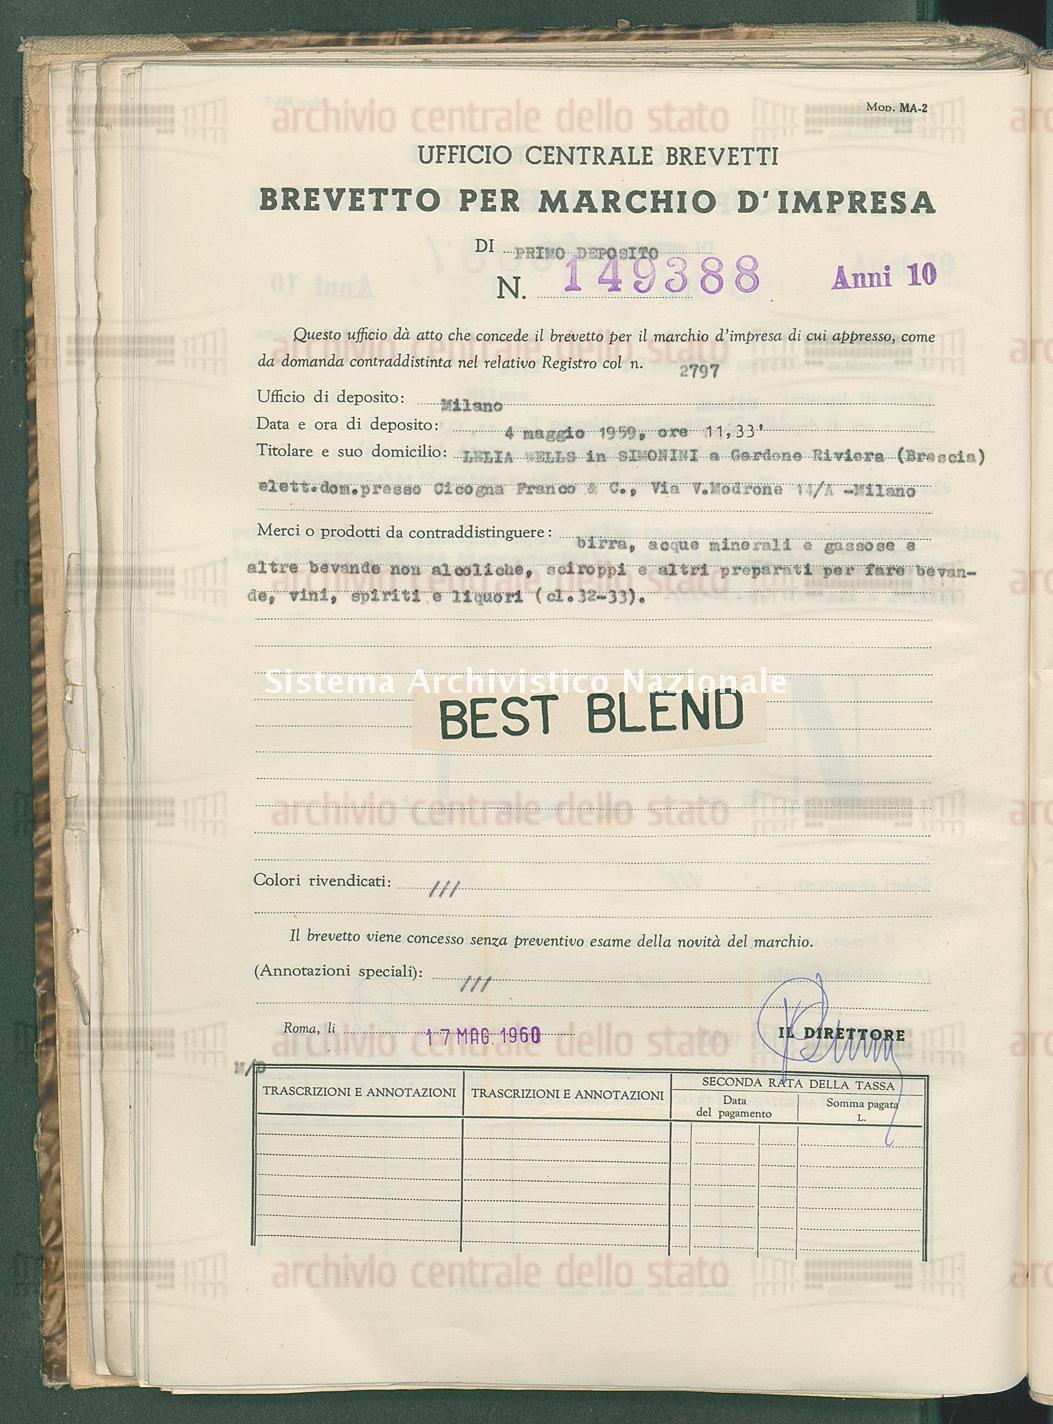 Birra, acque minerali ecc. Lelia Wells In Simonini (17/05/1960)